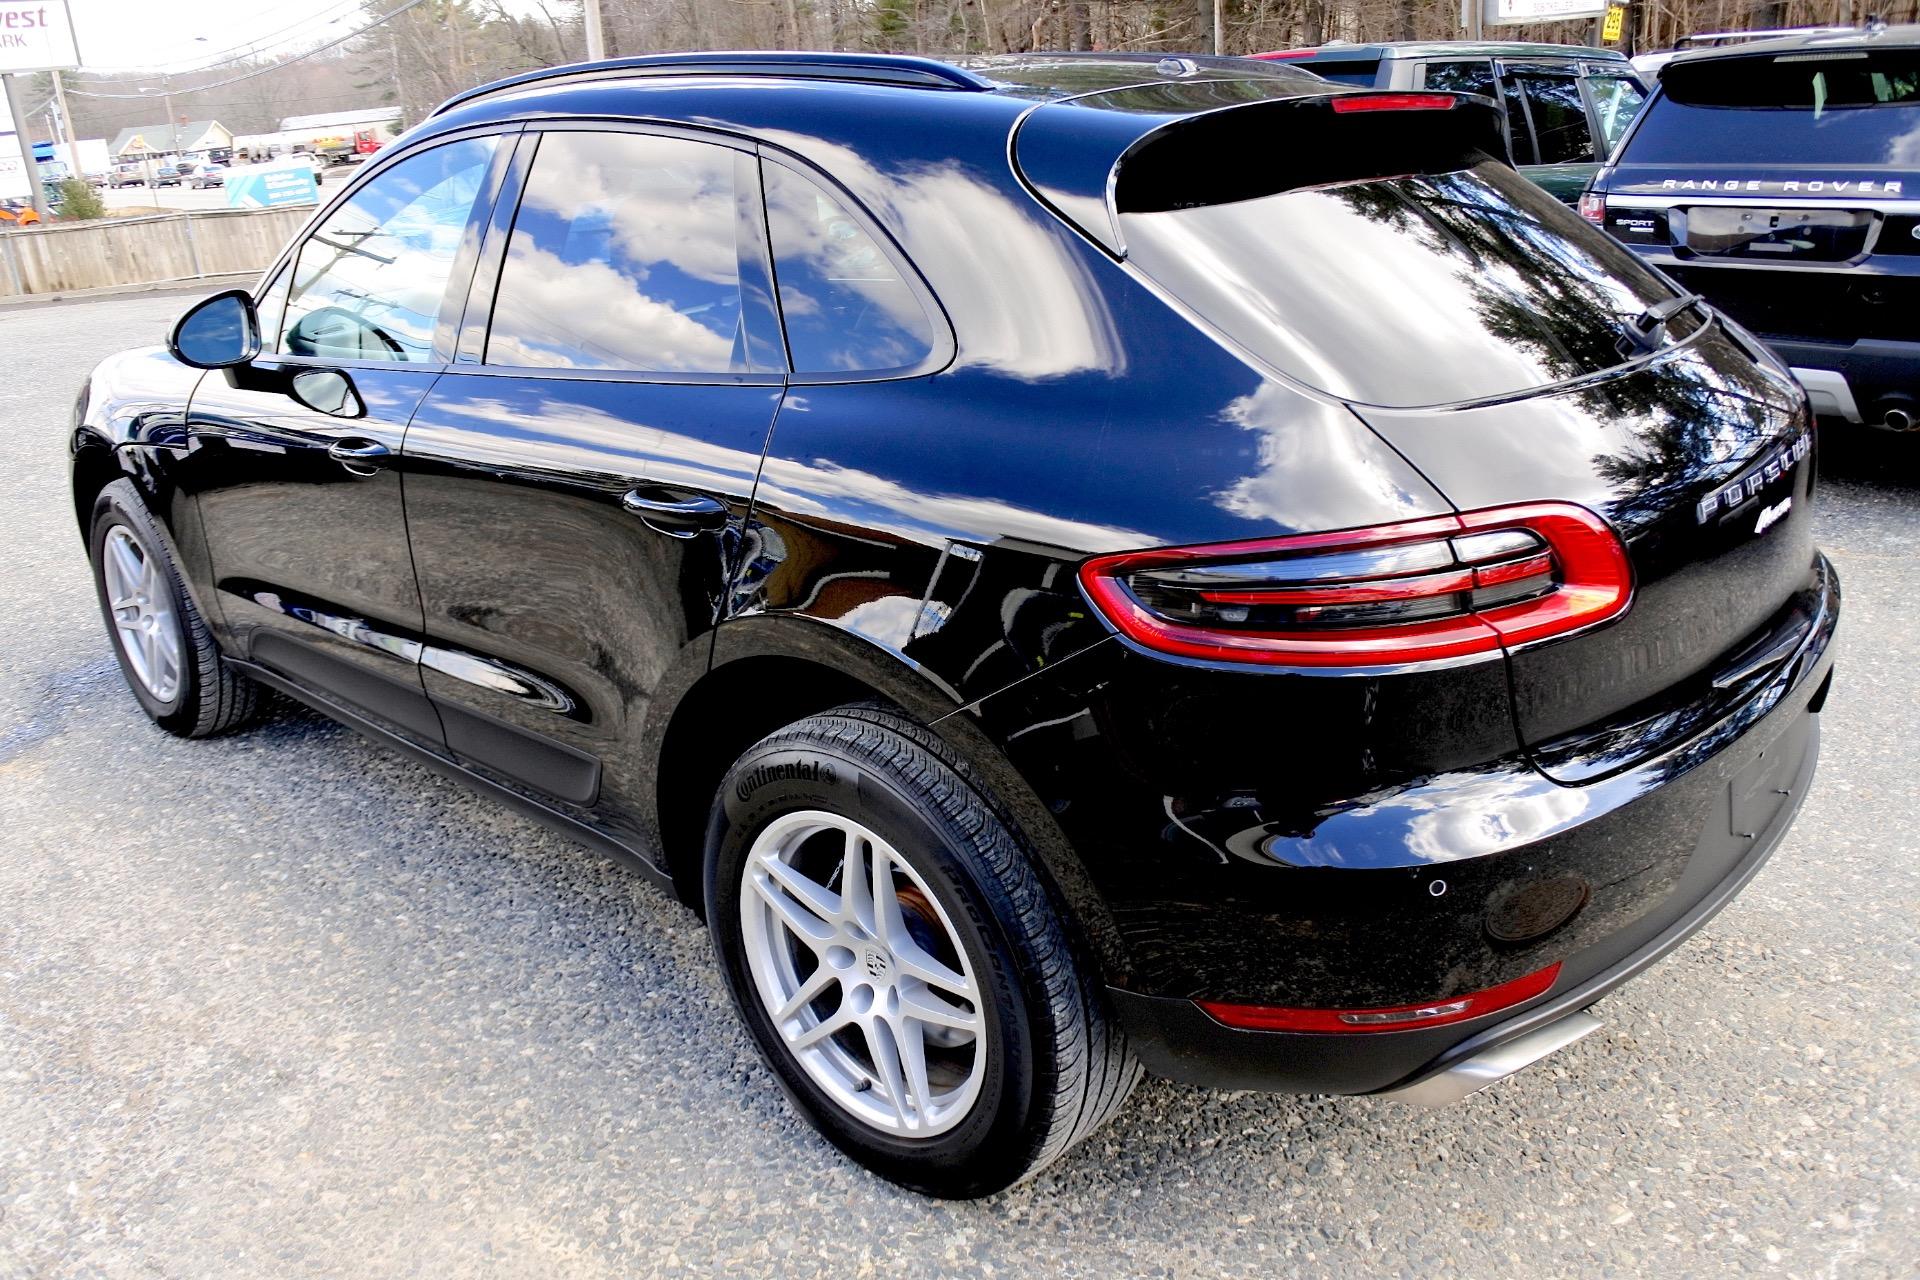 Used 2017 Porsche Macan AWD Used 2017 Porsche Macan AWD for sale  at Metro West Motorcars LLC in Shrewsbury MA 3